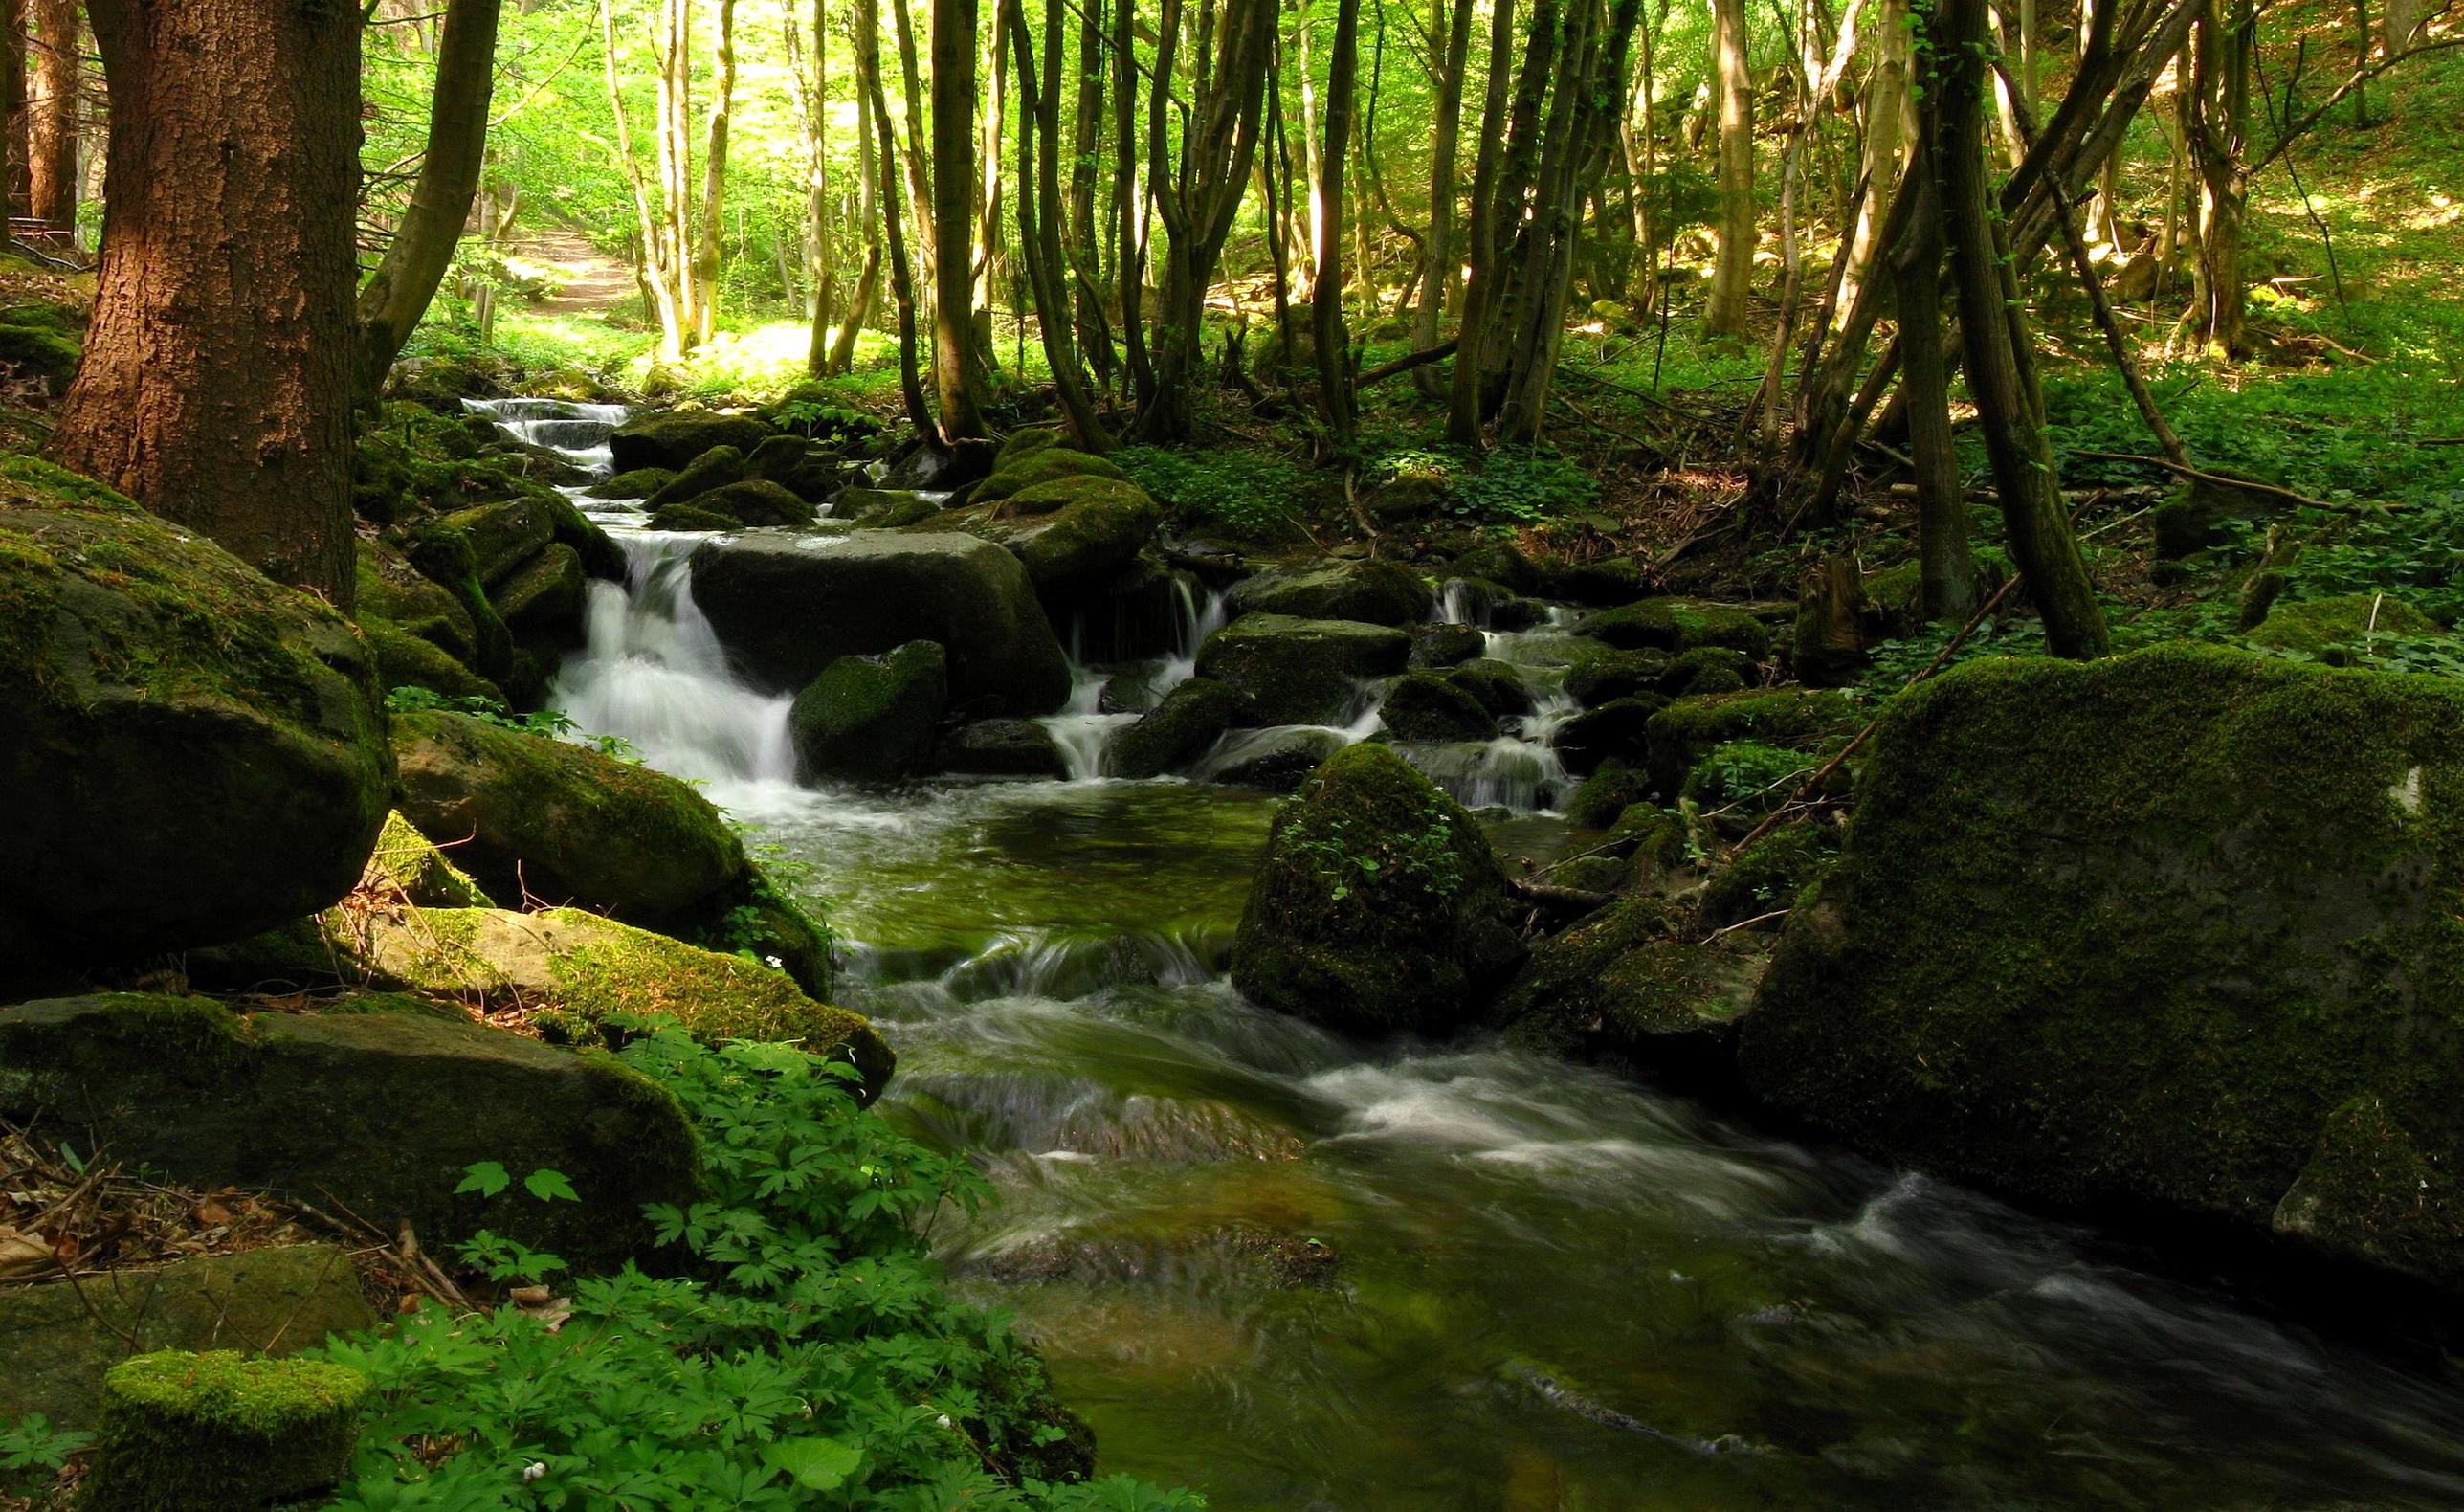 Earth - Waterfall  Stream River Forest Scenic Landscape Wallpaper